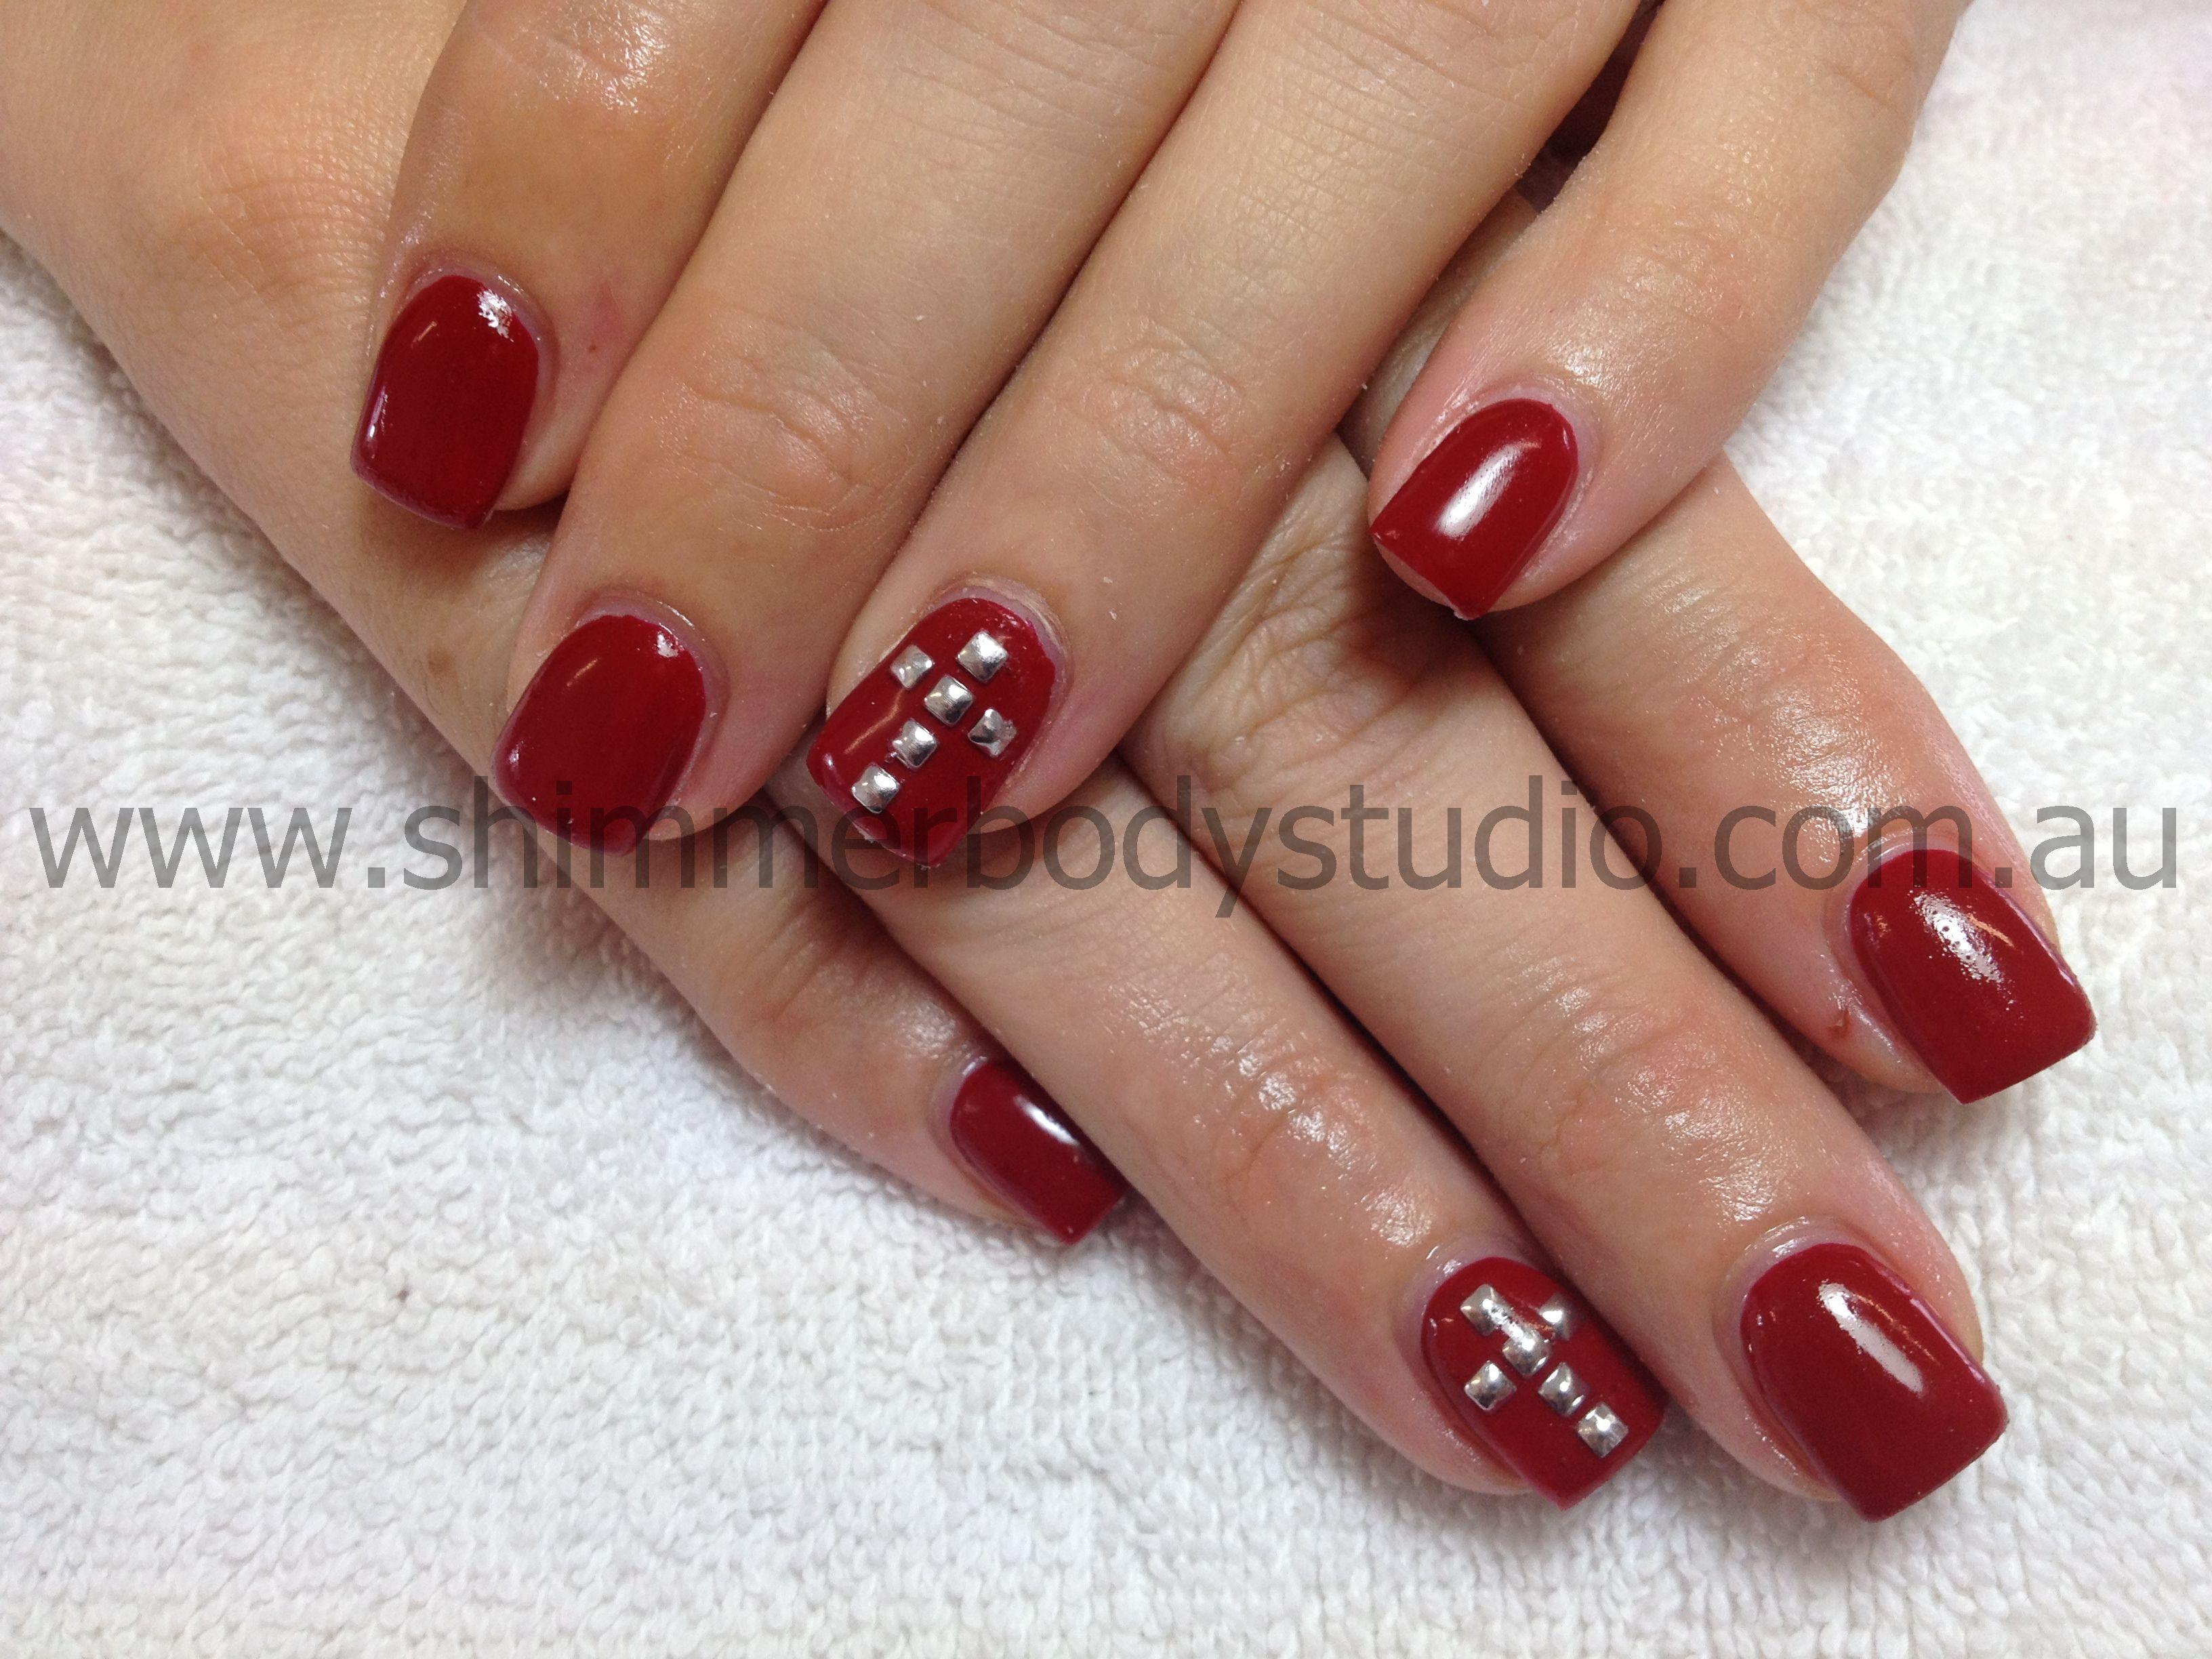 Gel Nails, Red Nails, Cross nail Art, Studs. | Nails: Full Colour ...